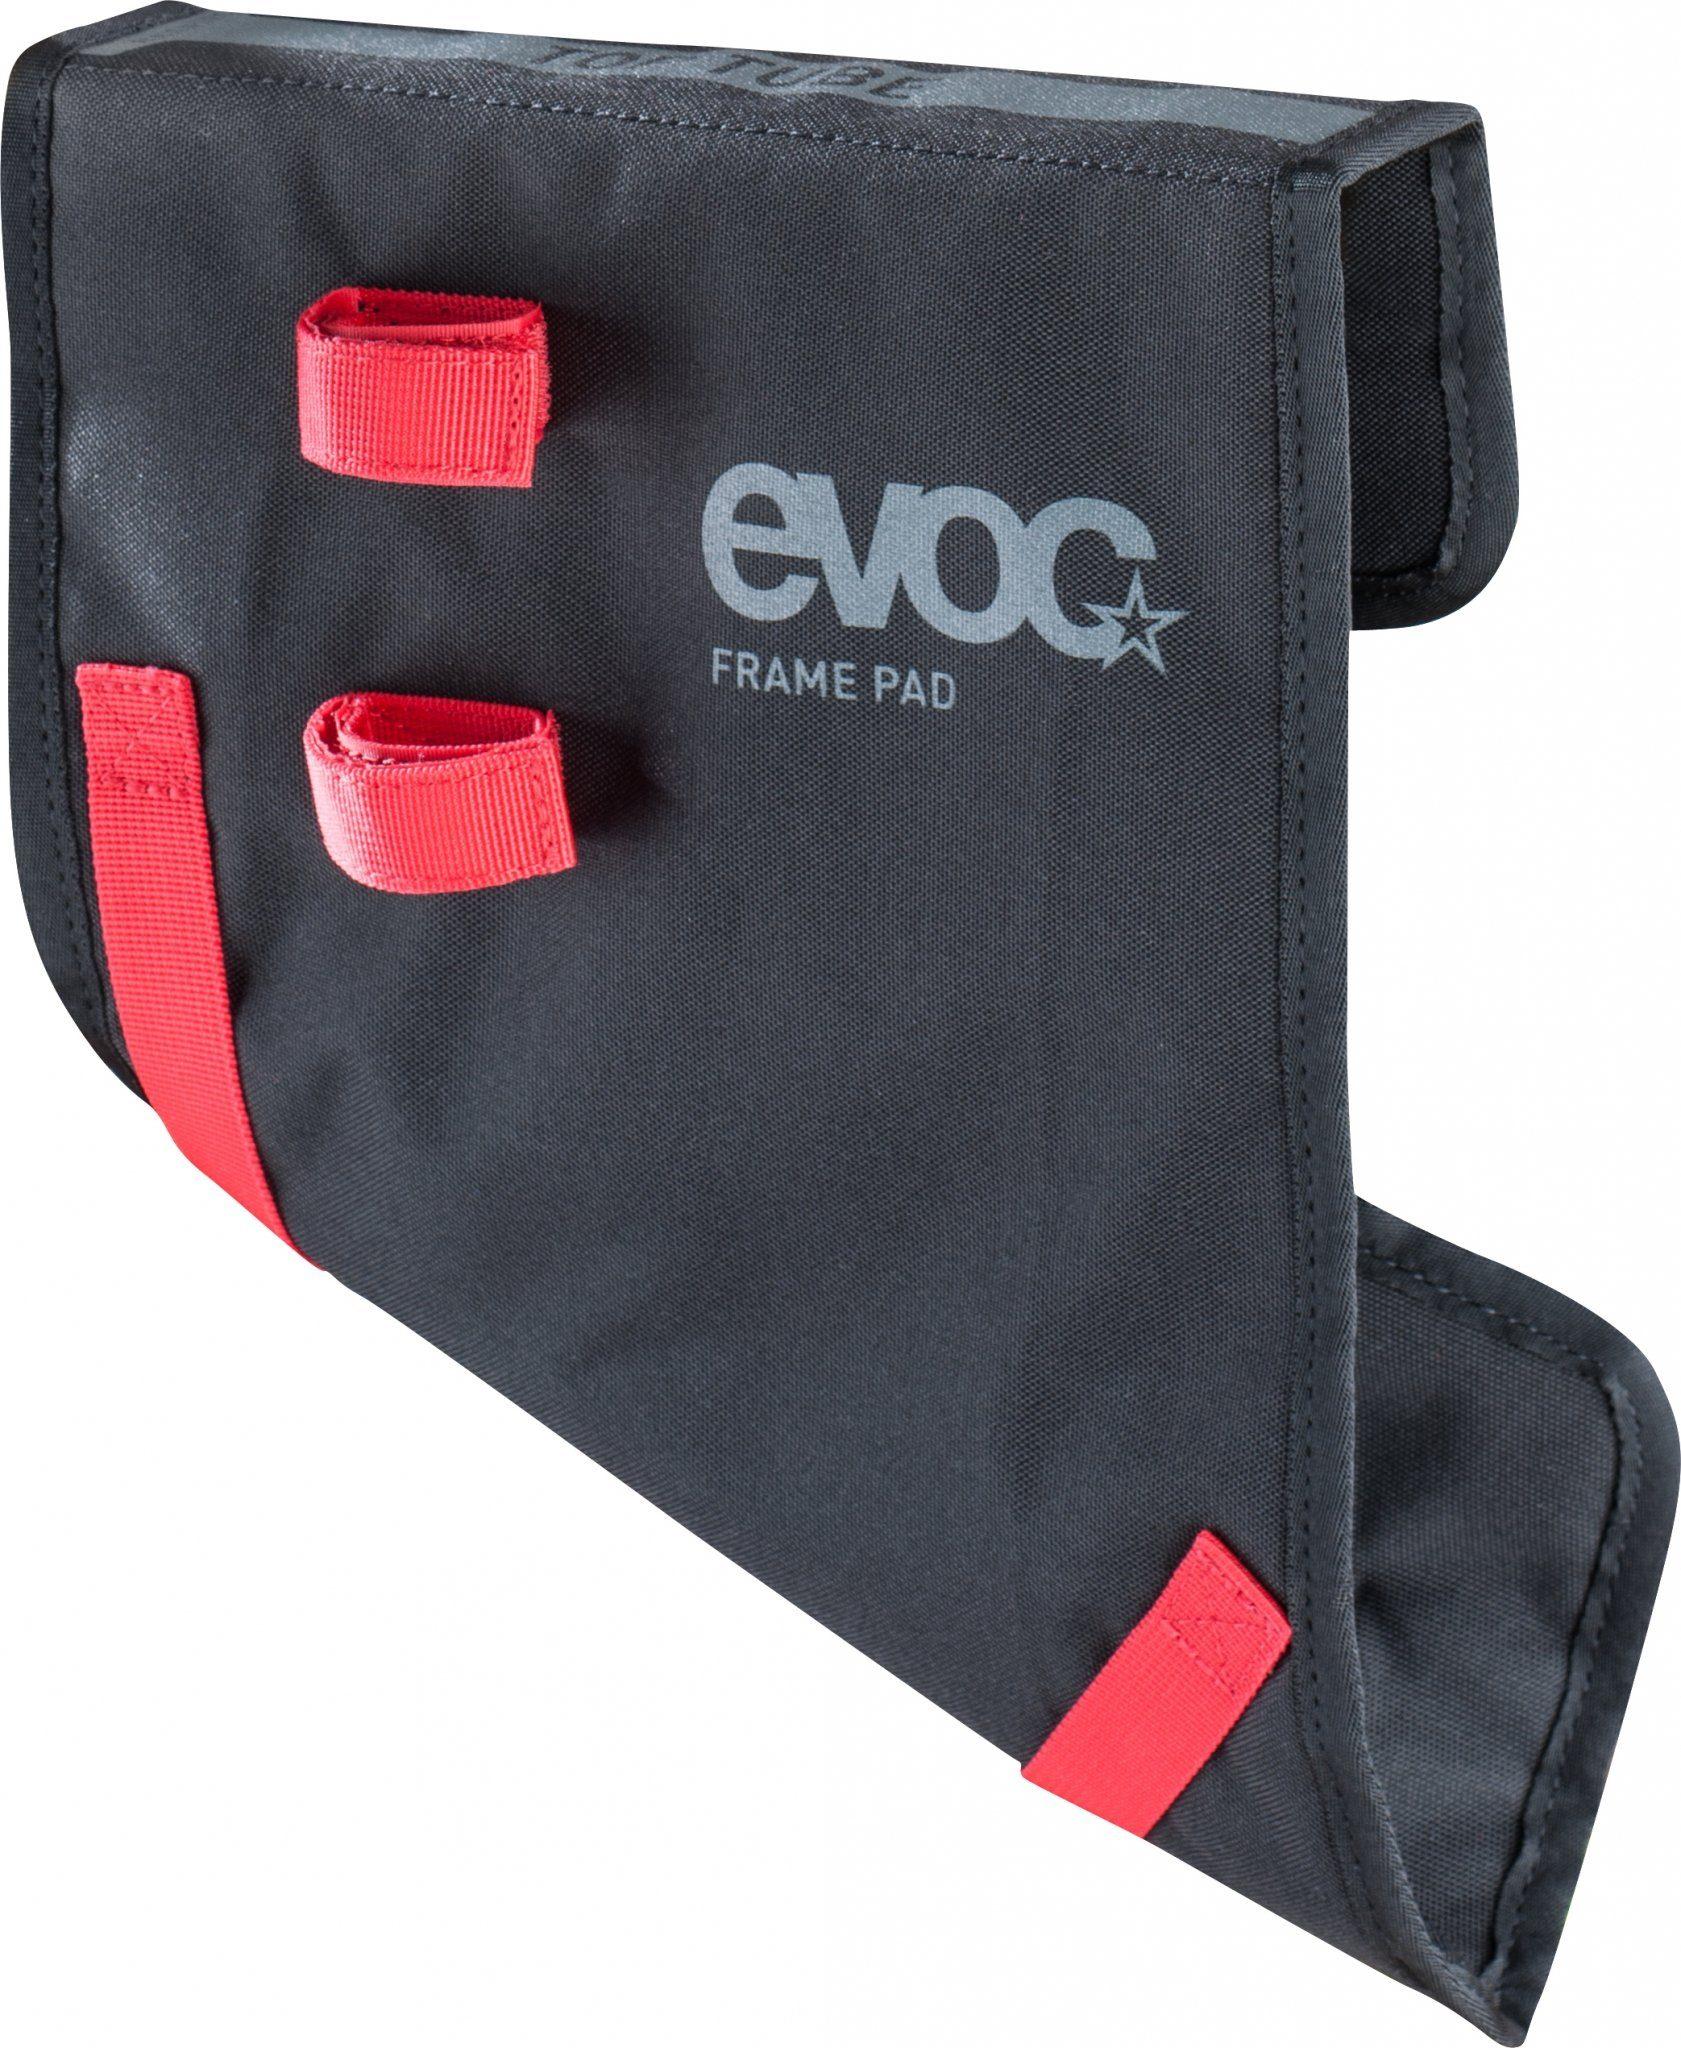 EVOC Fahrrad Schutzhülle »Evoc Frame Pad 2.0«